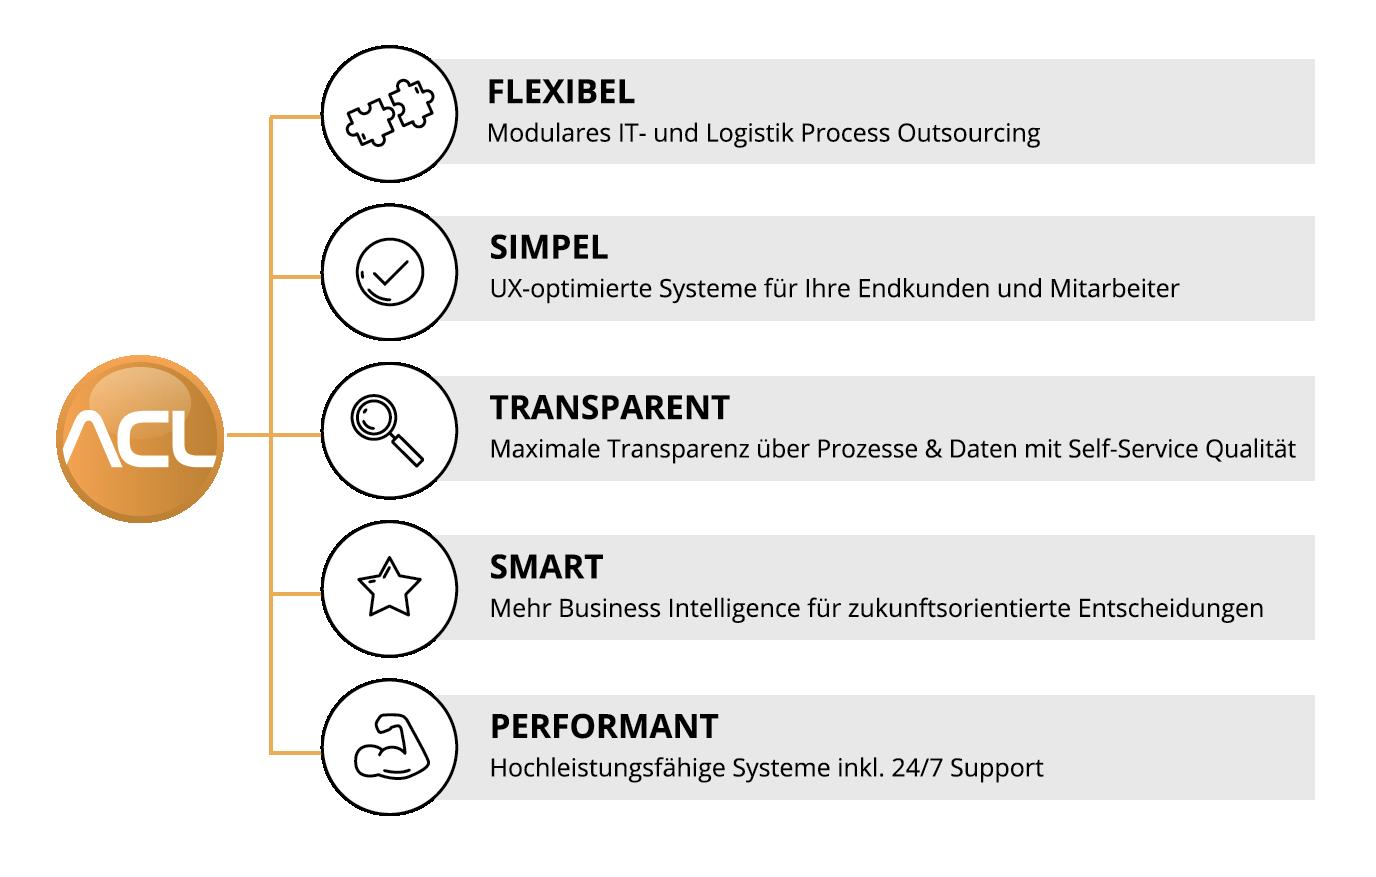 ACL Entwickler-Prinzipien: Flexibel, Simpel, Transparent, Smart, Performant